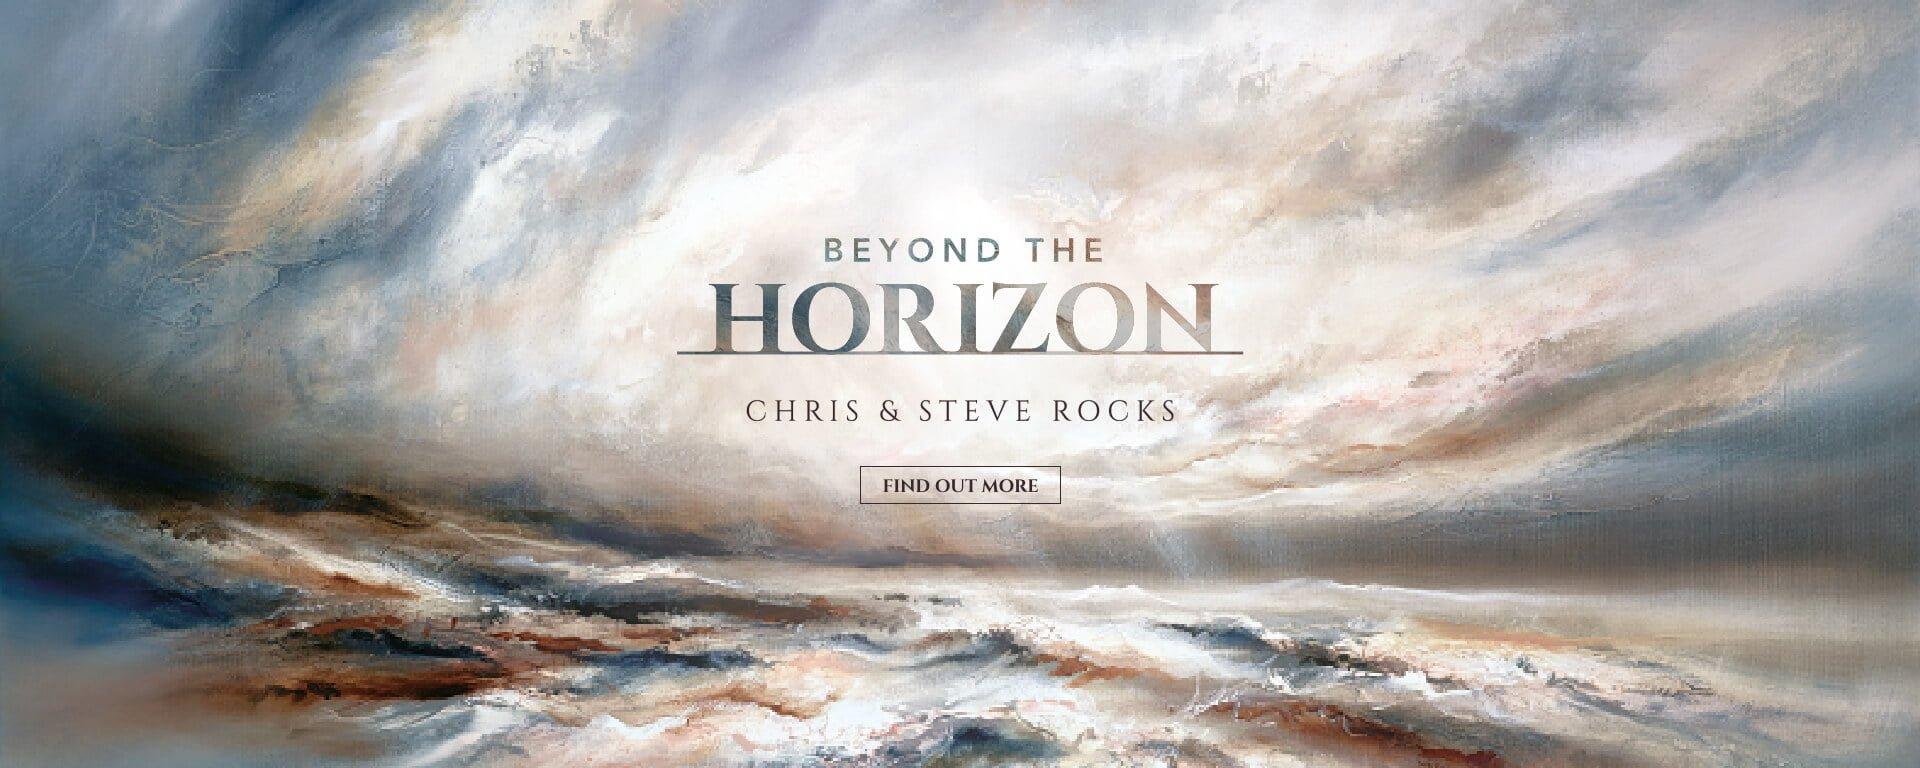 Chris & Steve Rocks | Beyond the Horizon